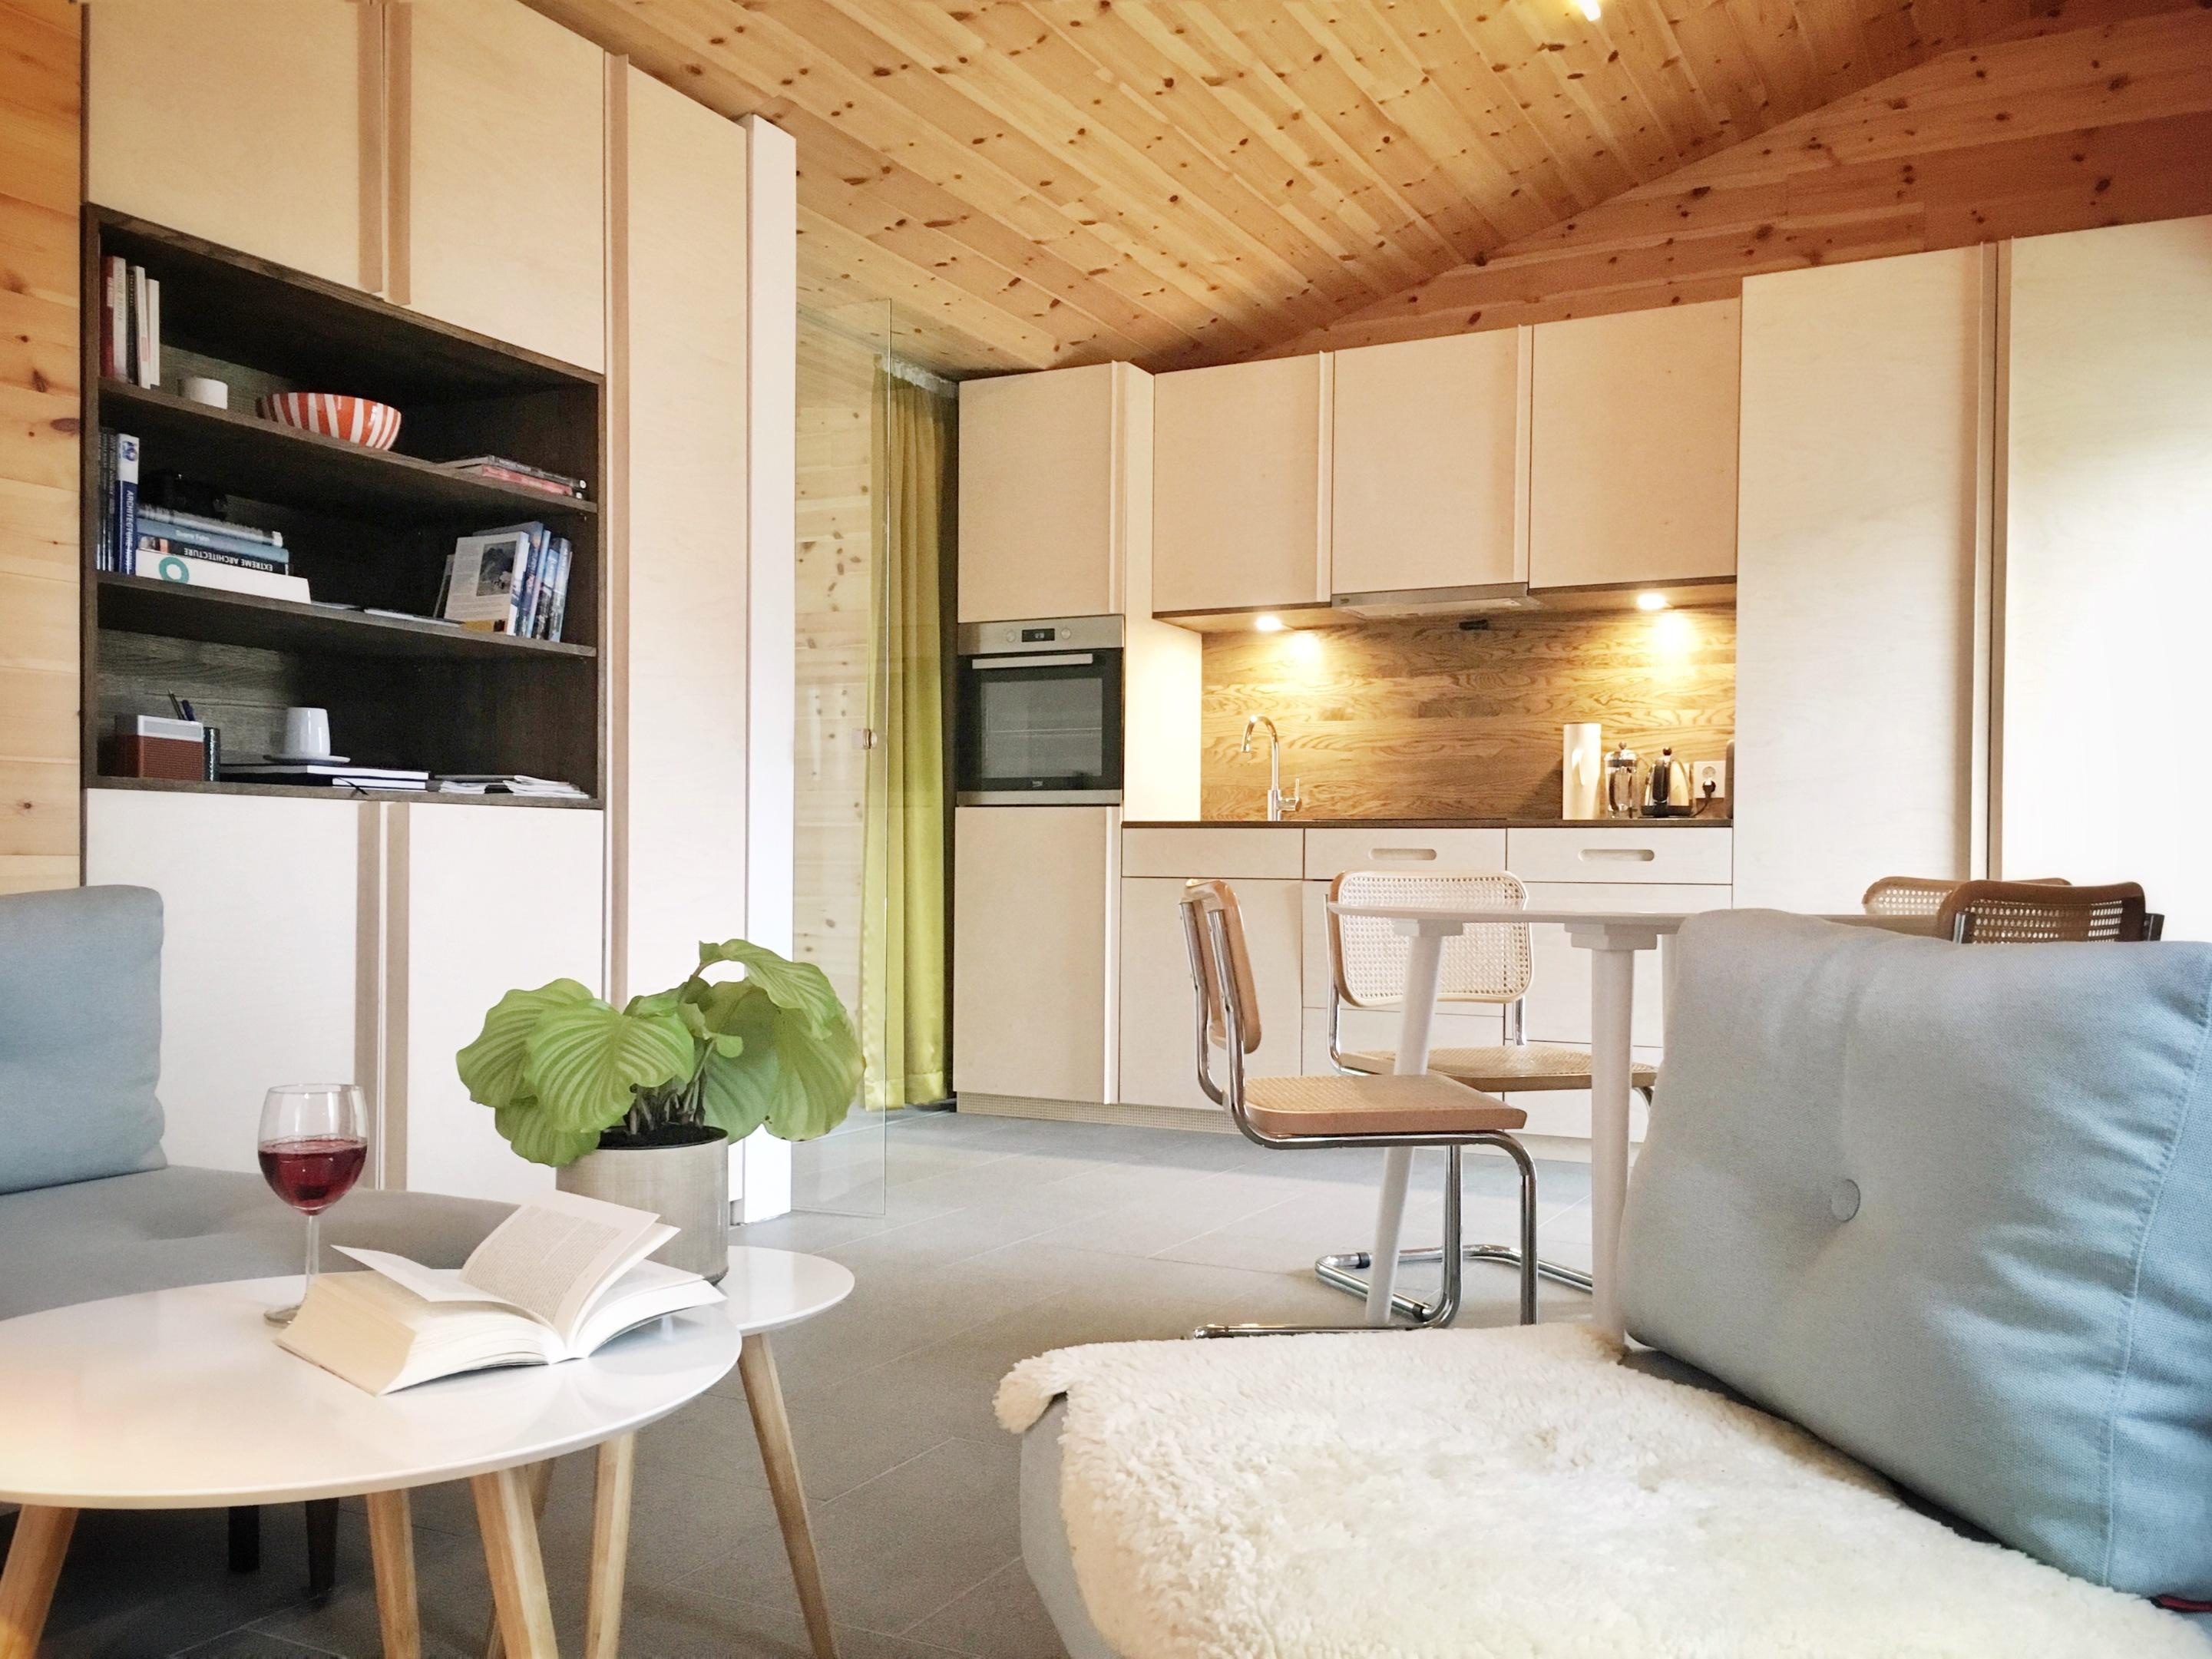 Standard-Apartment-Private Bathroom-Mountain View-Apartment 01  - Basistarif